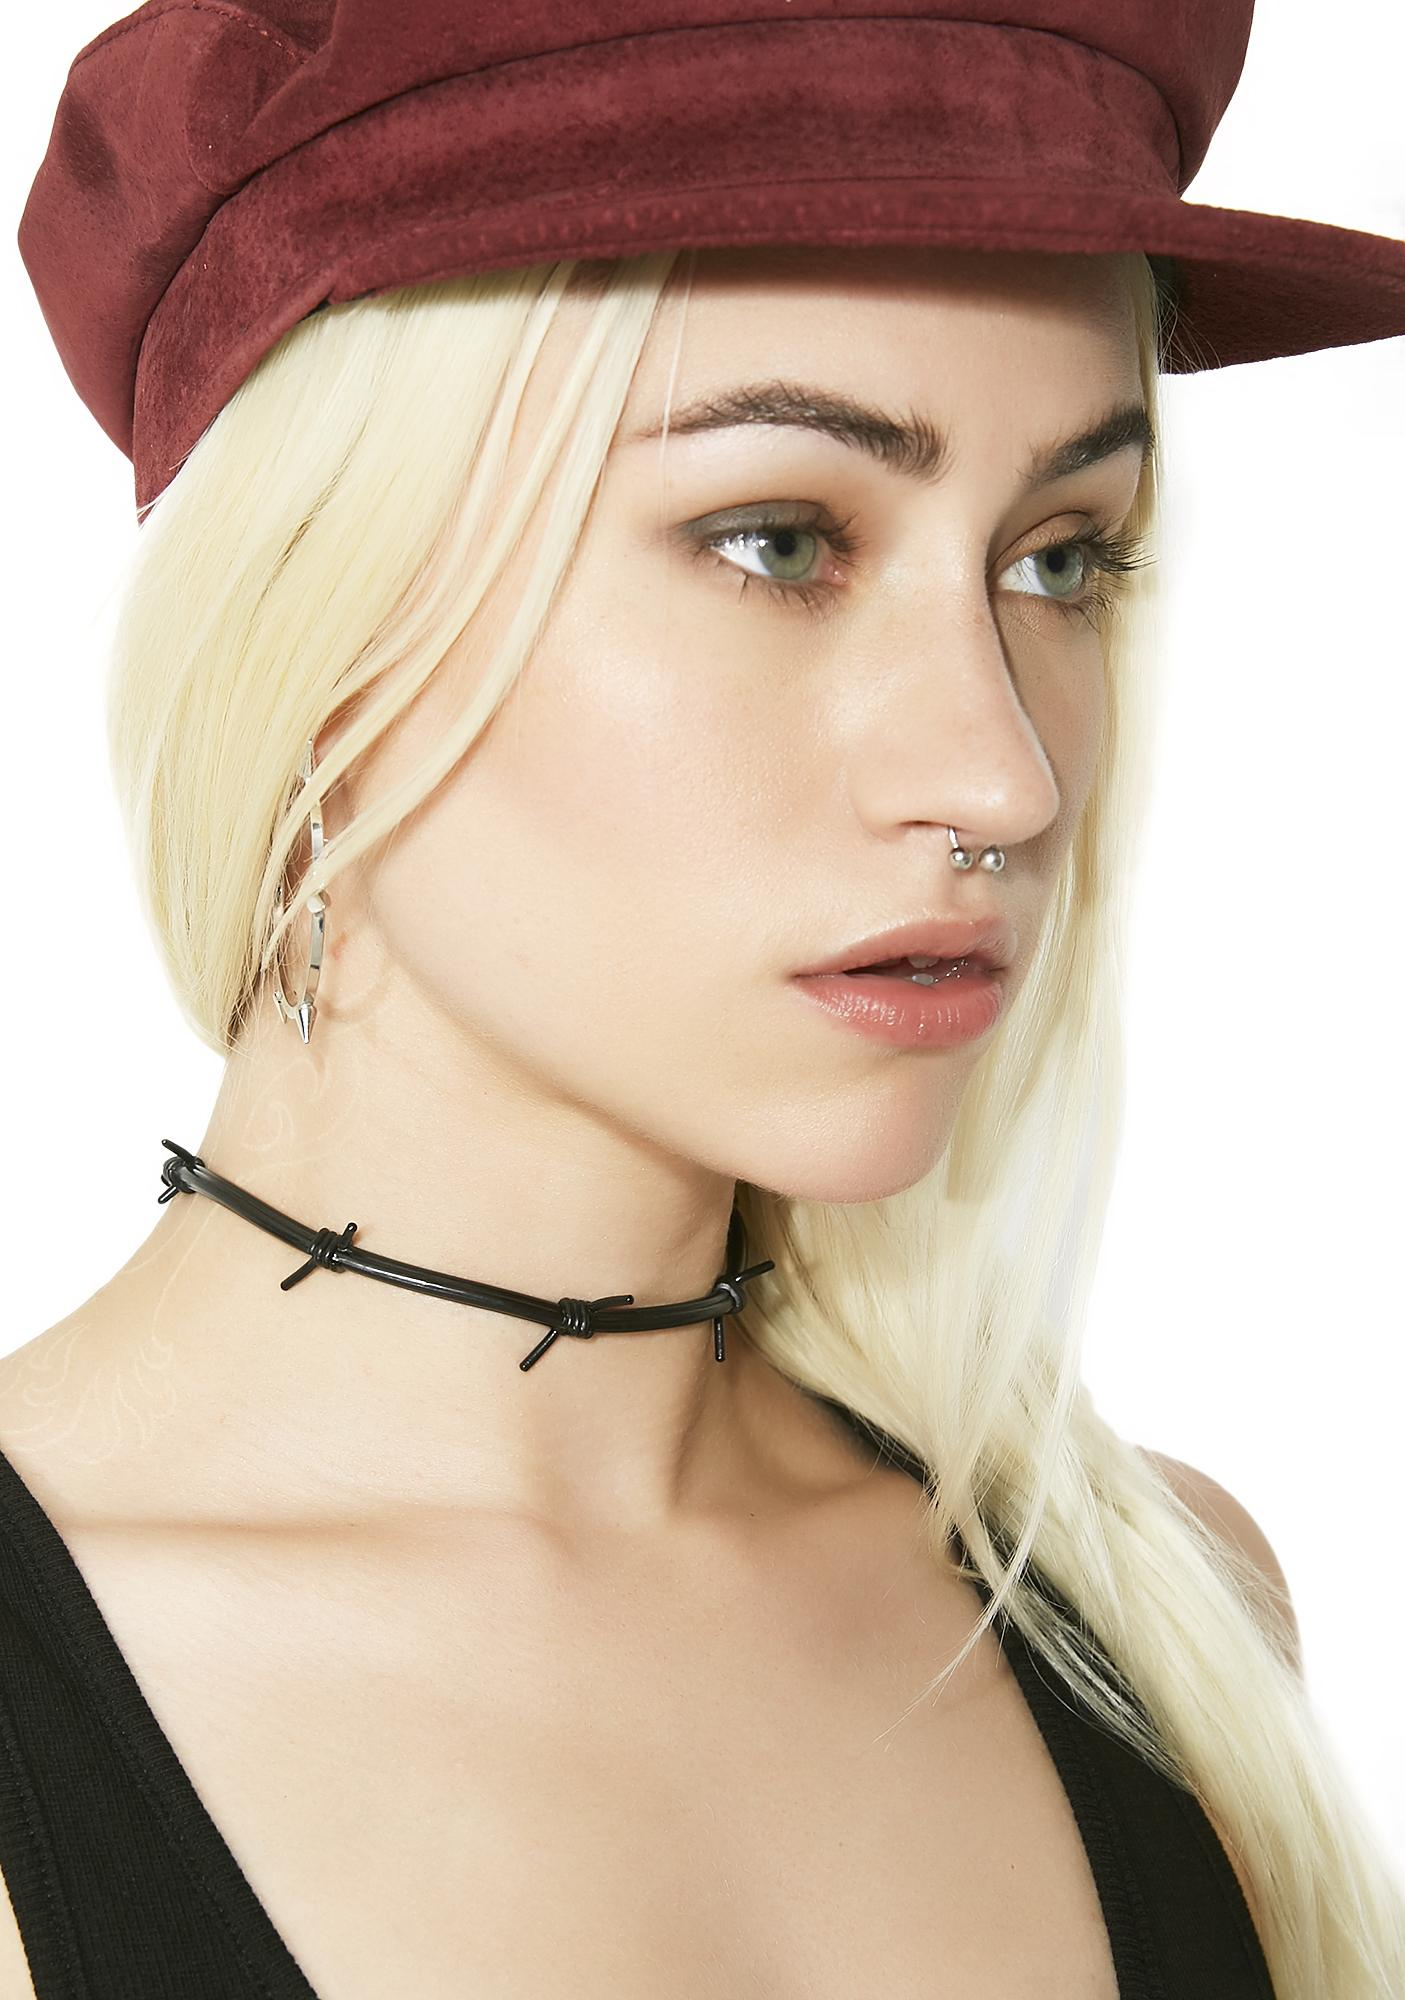 Bitchin' Barb Wire Choker